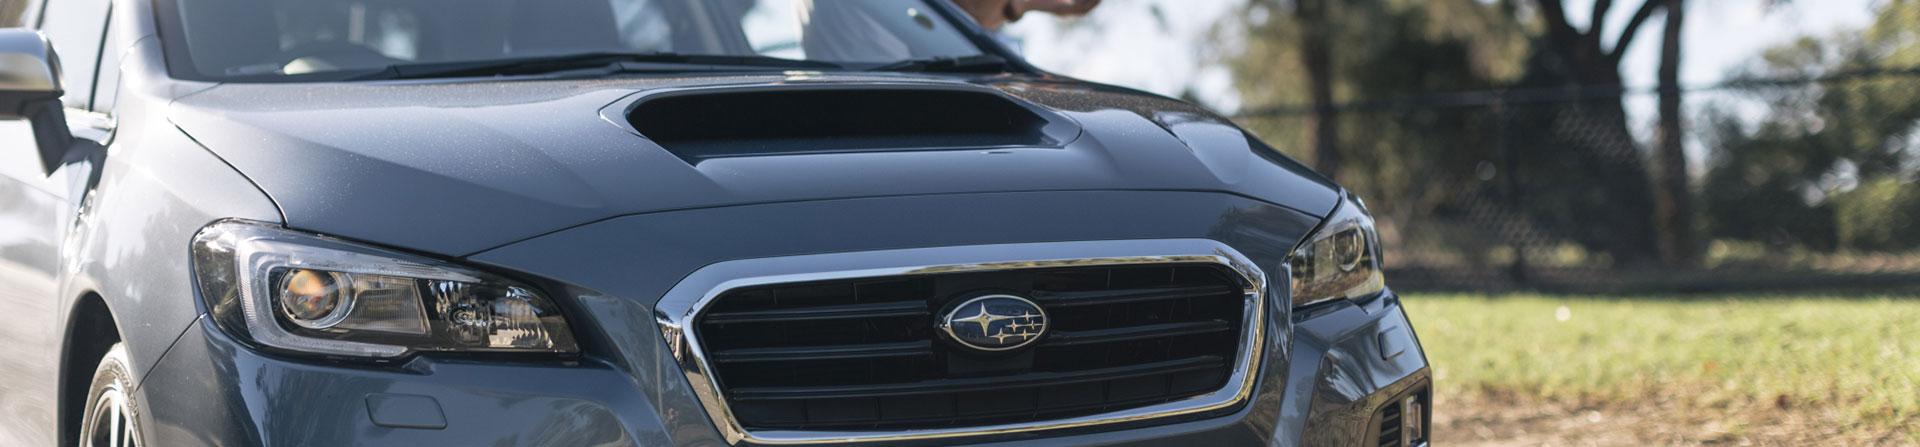 Subaru Levorg Image 1